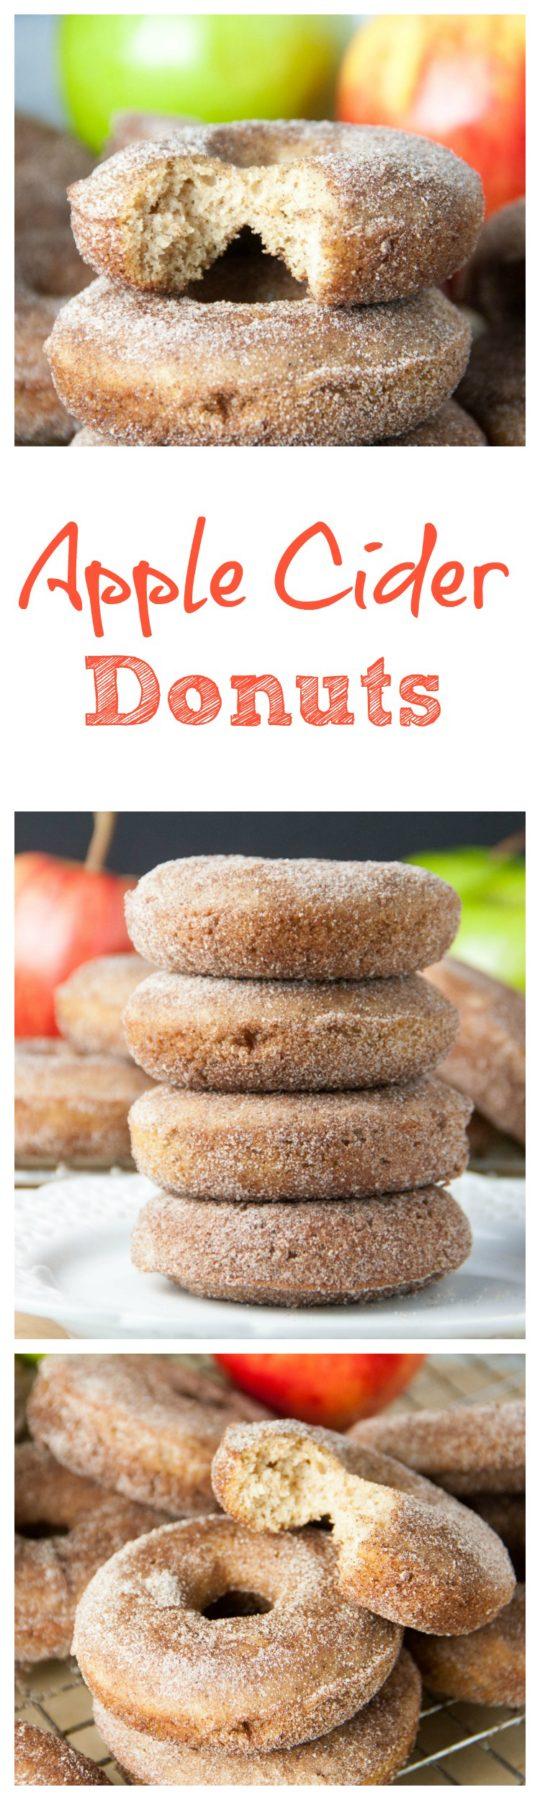 Apple Cider Doughnuts - Boston Girl Bakes